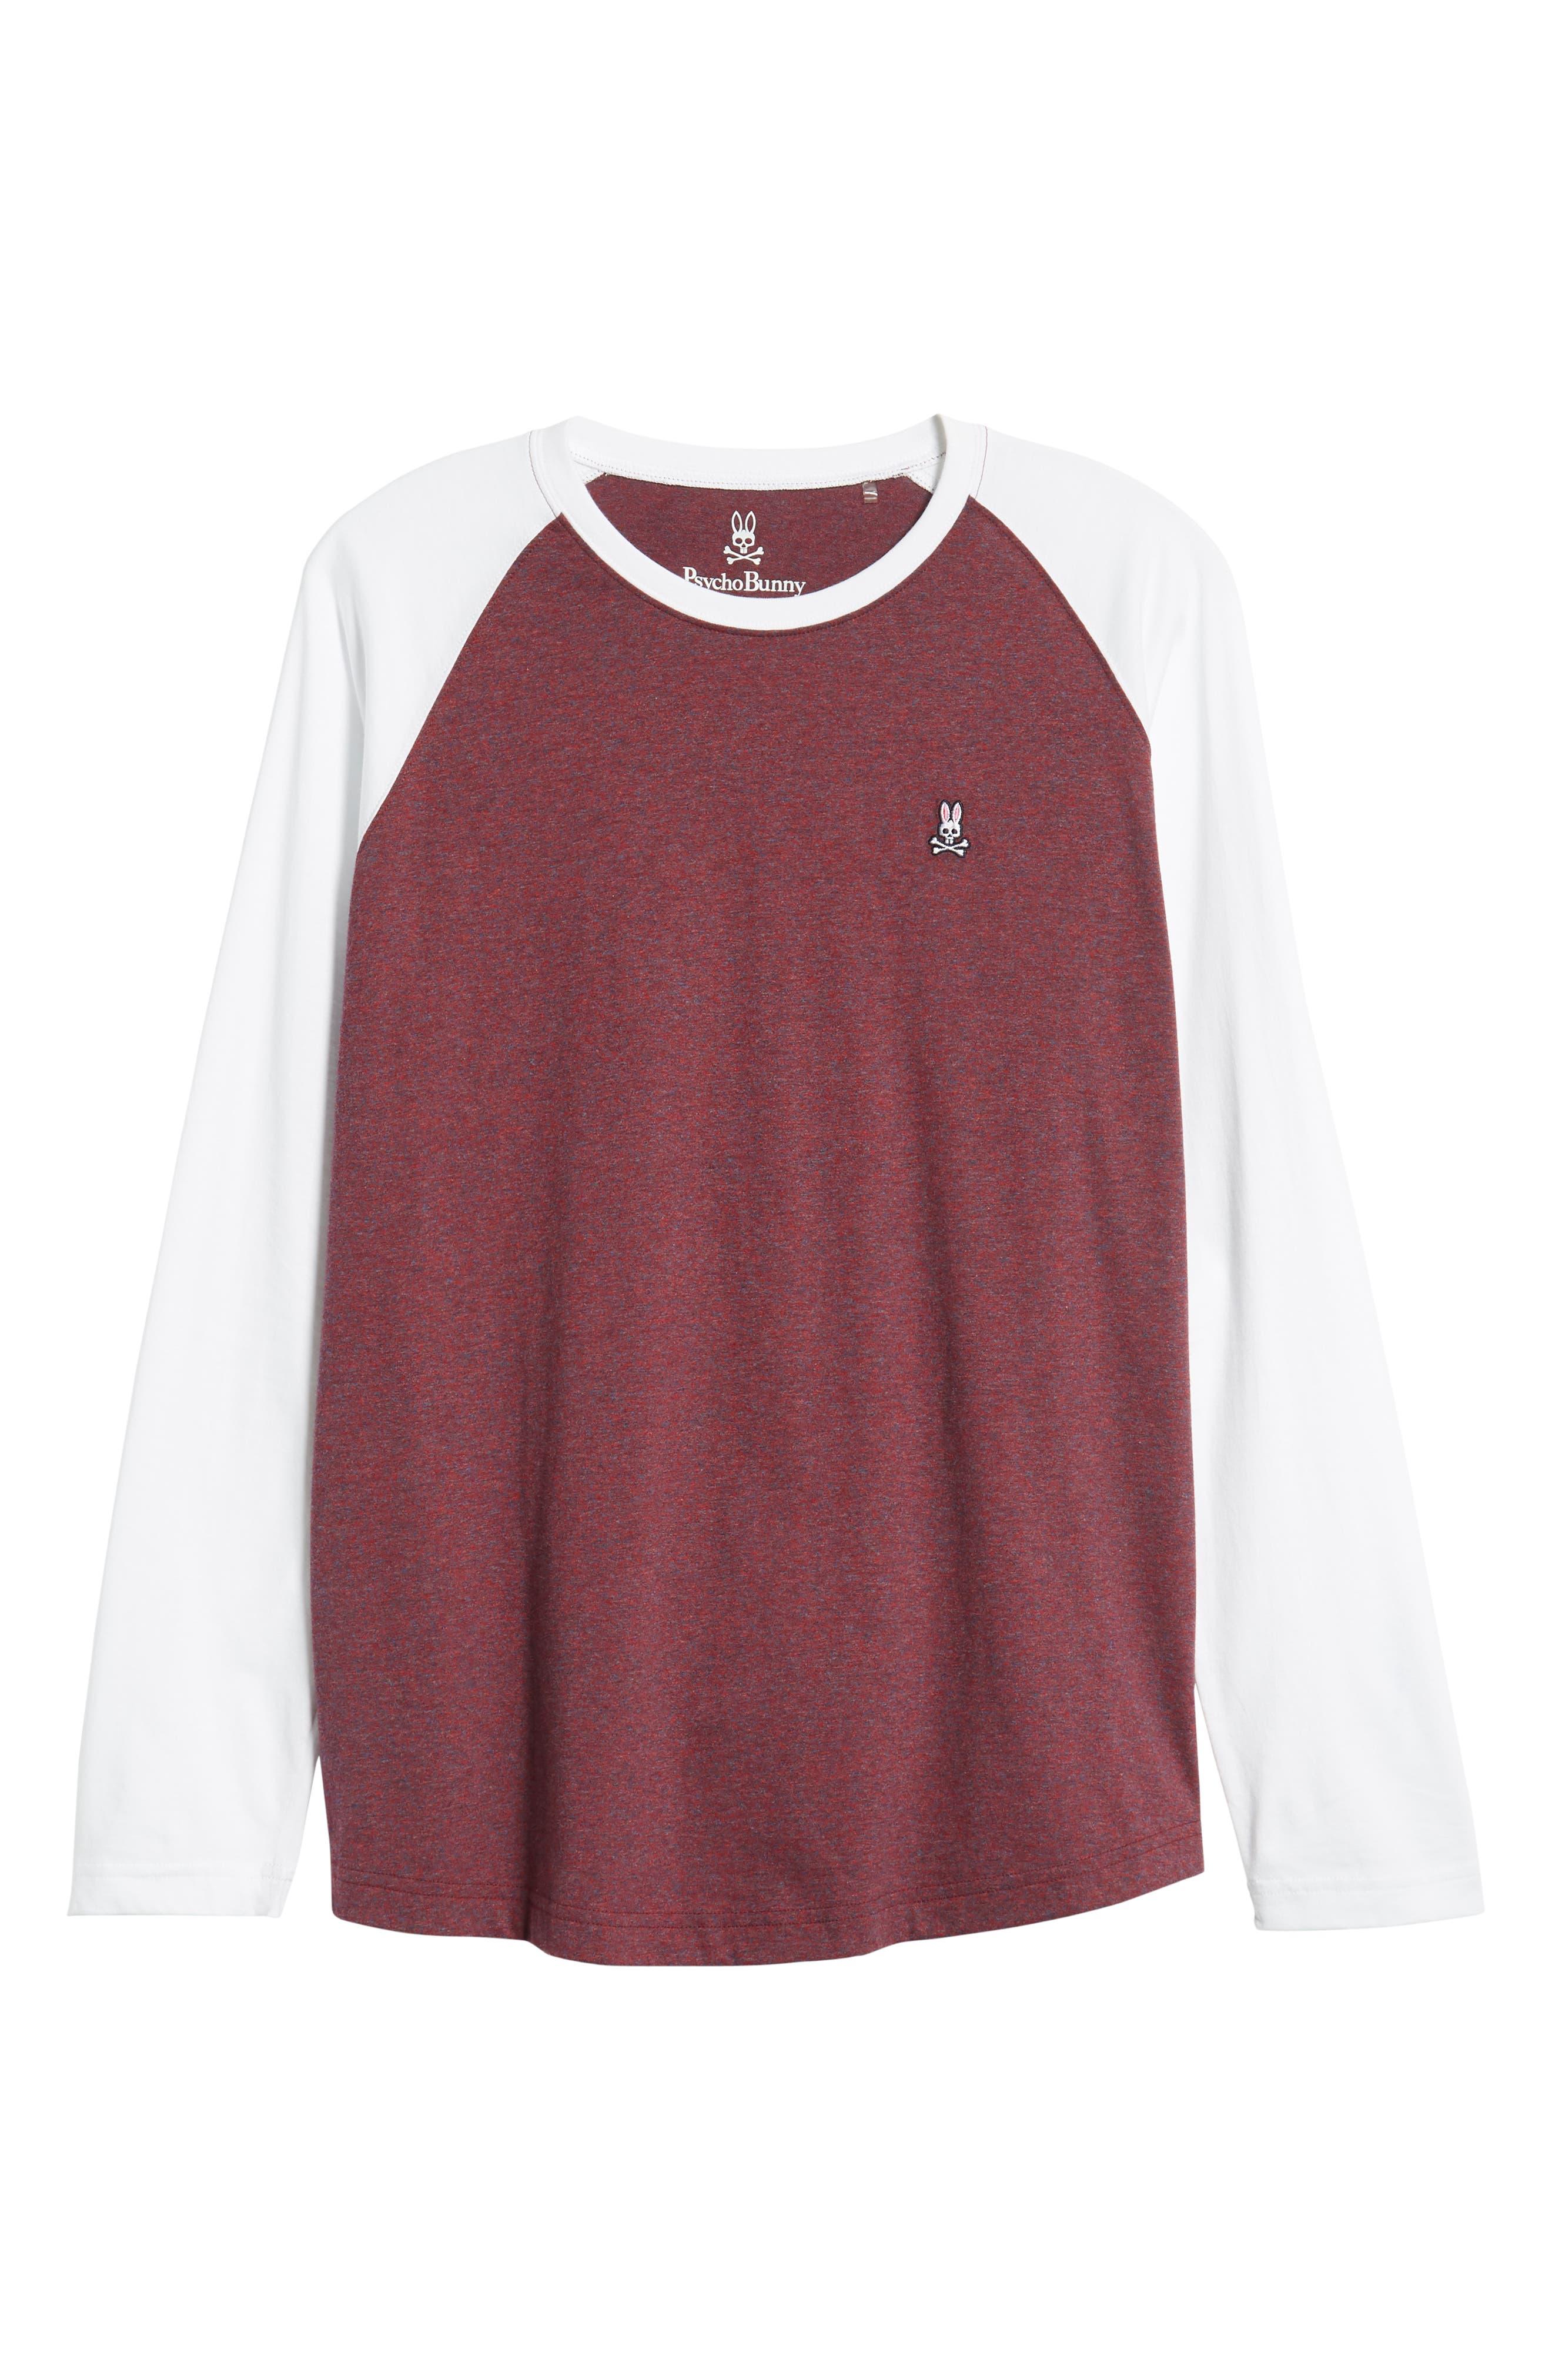 Cobb Raglan T-Shirt,                             Alternate thumbnail 6, color,                             BURGUNDY SALT PEPPER